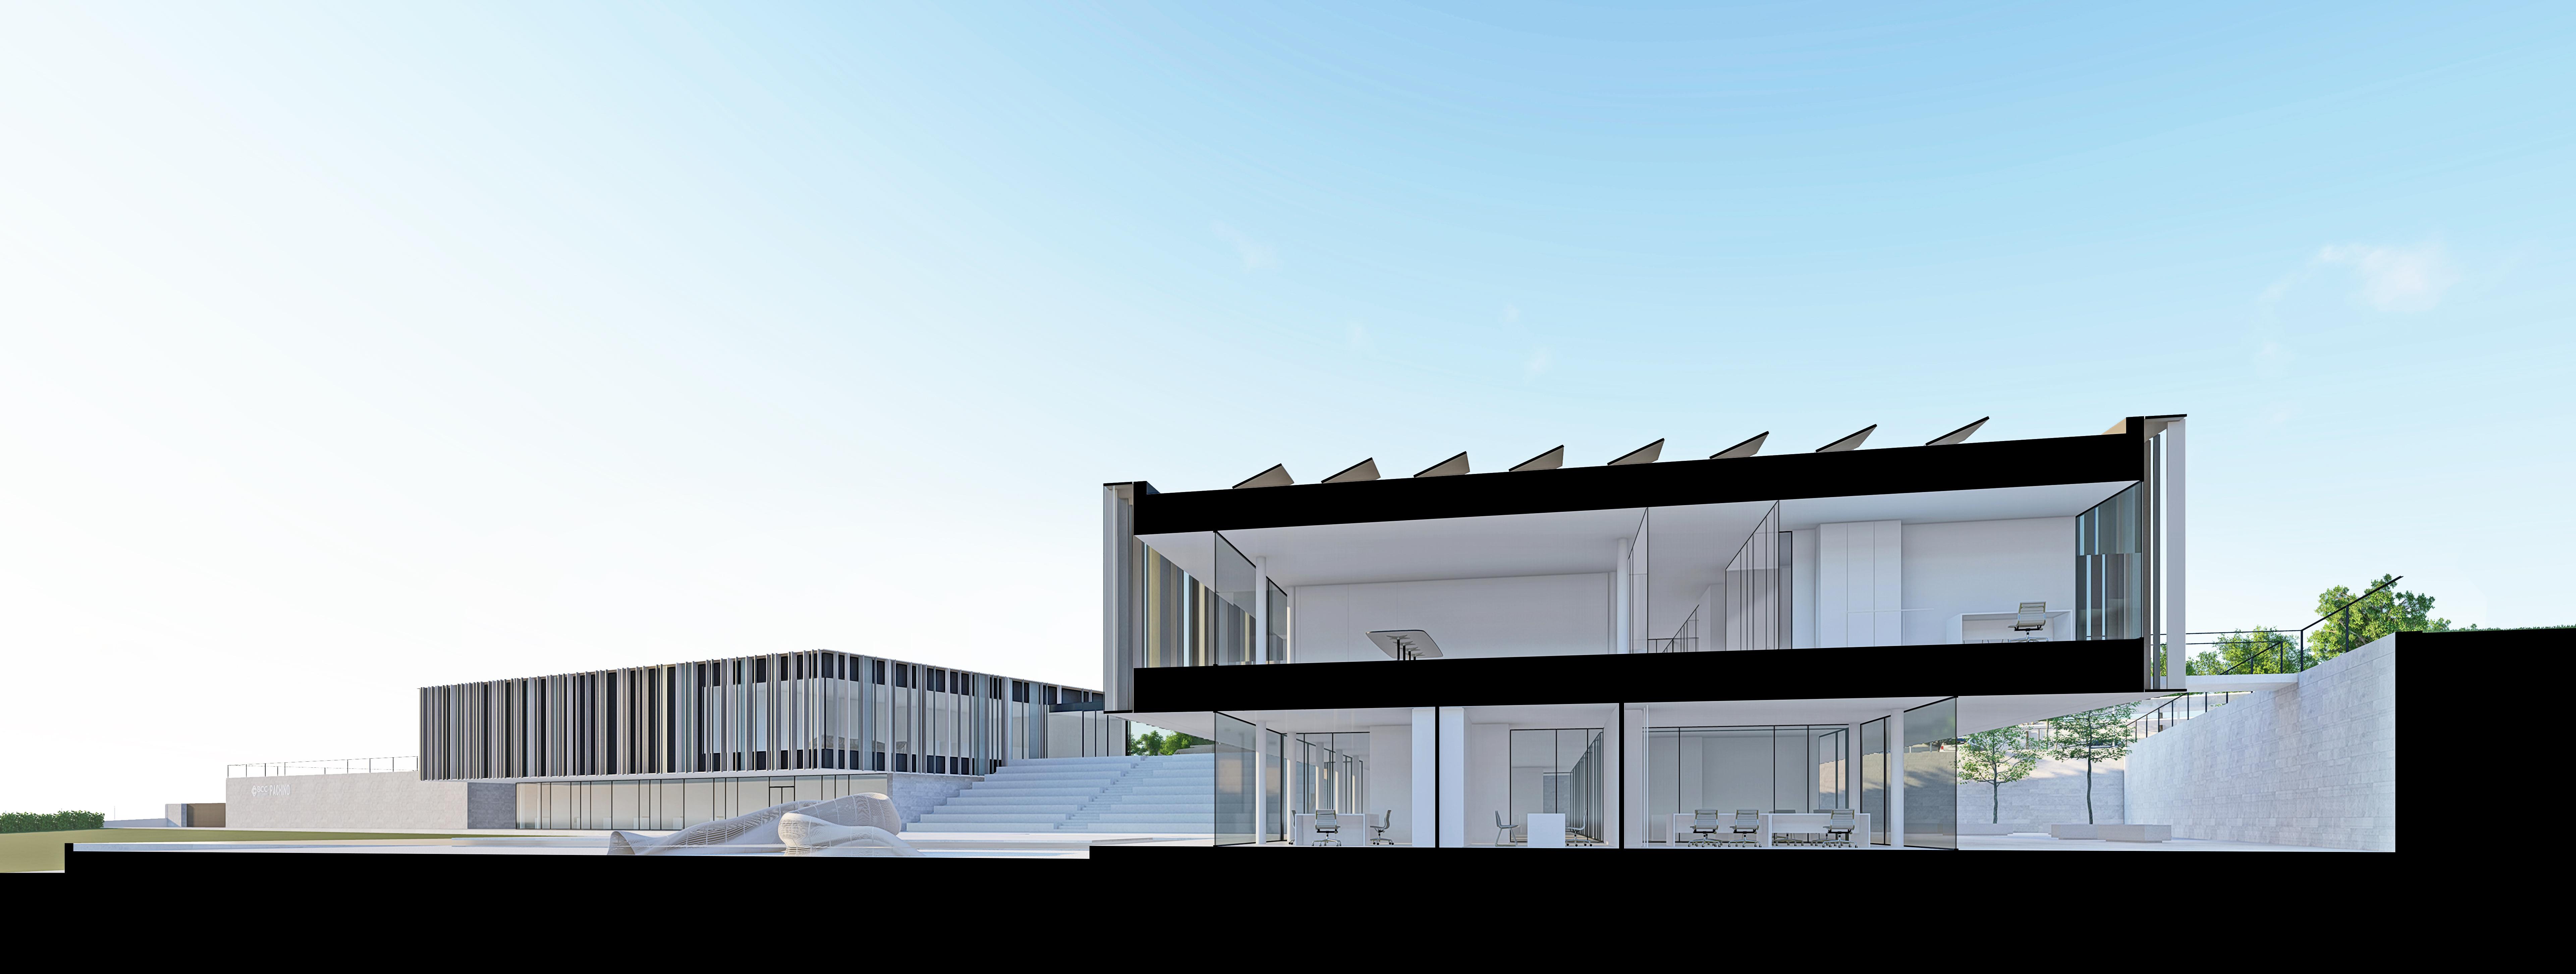 DFG-Architetti-Associati-Nuova-Sede-BCC-Pachino-24